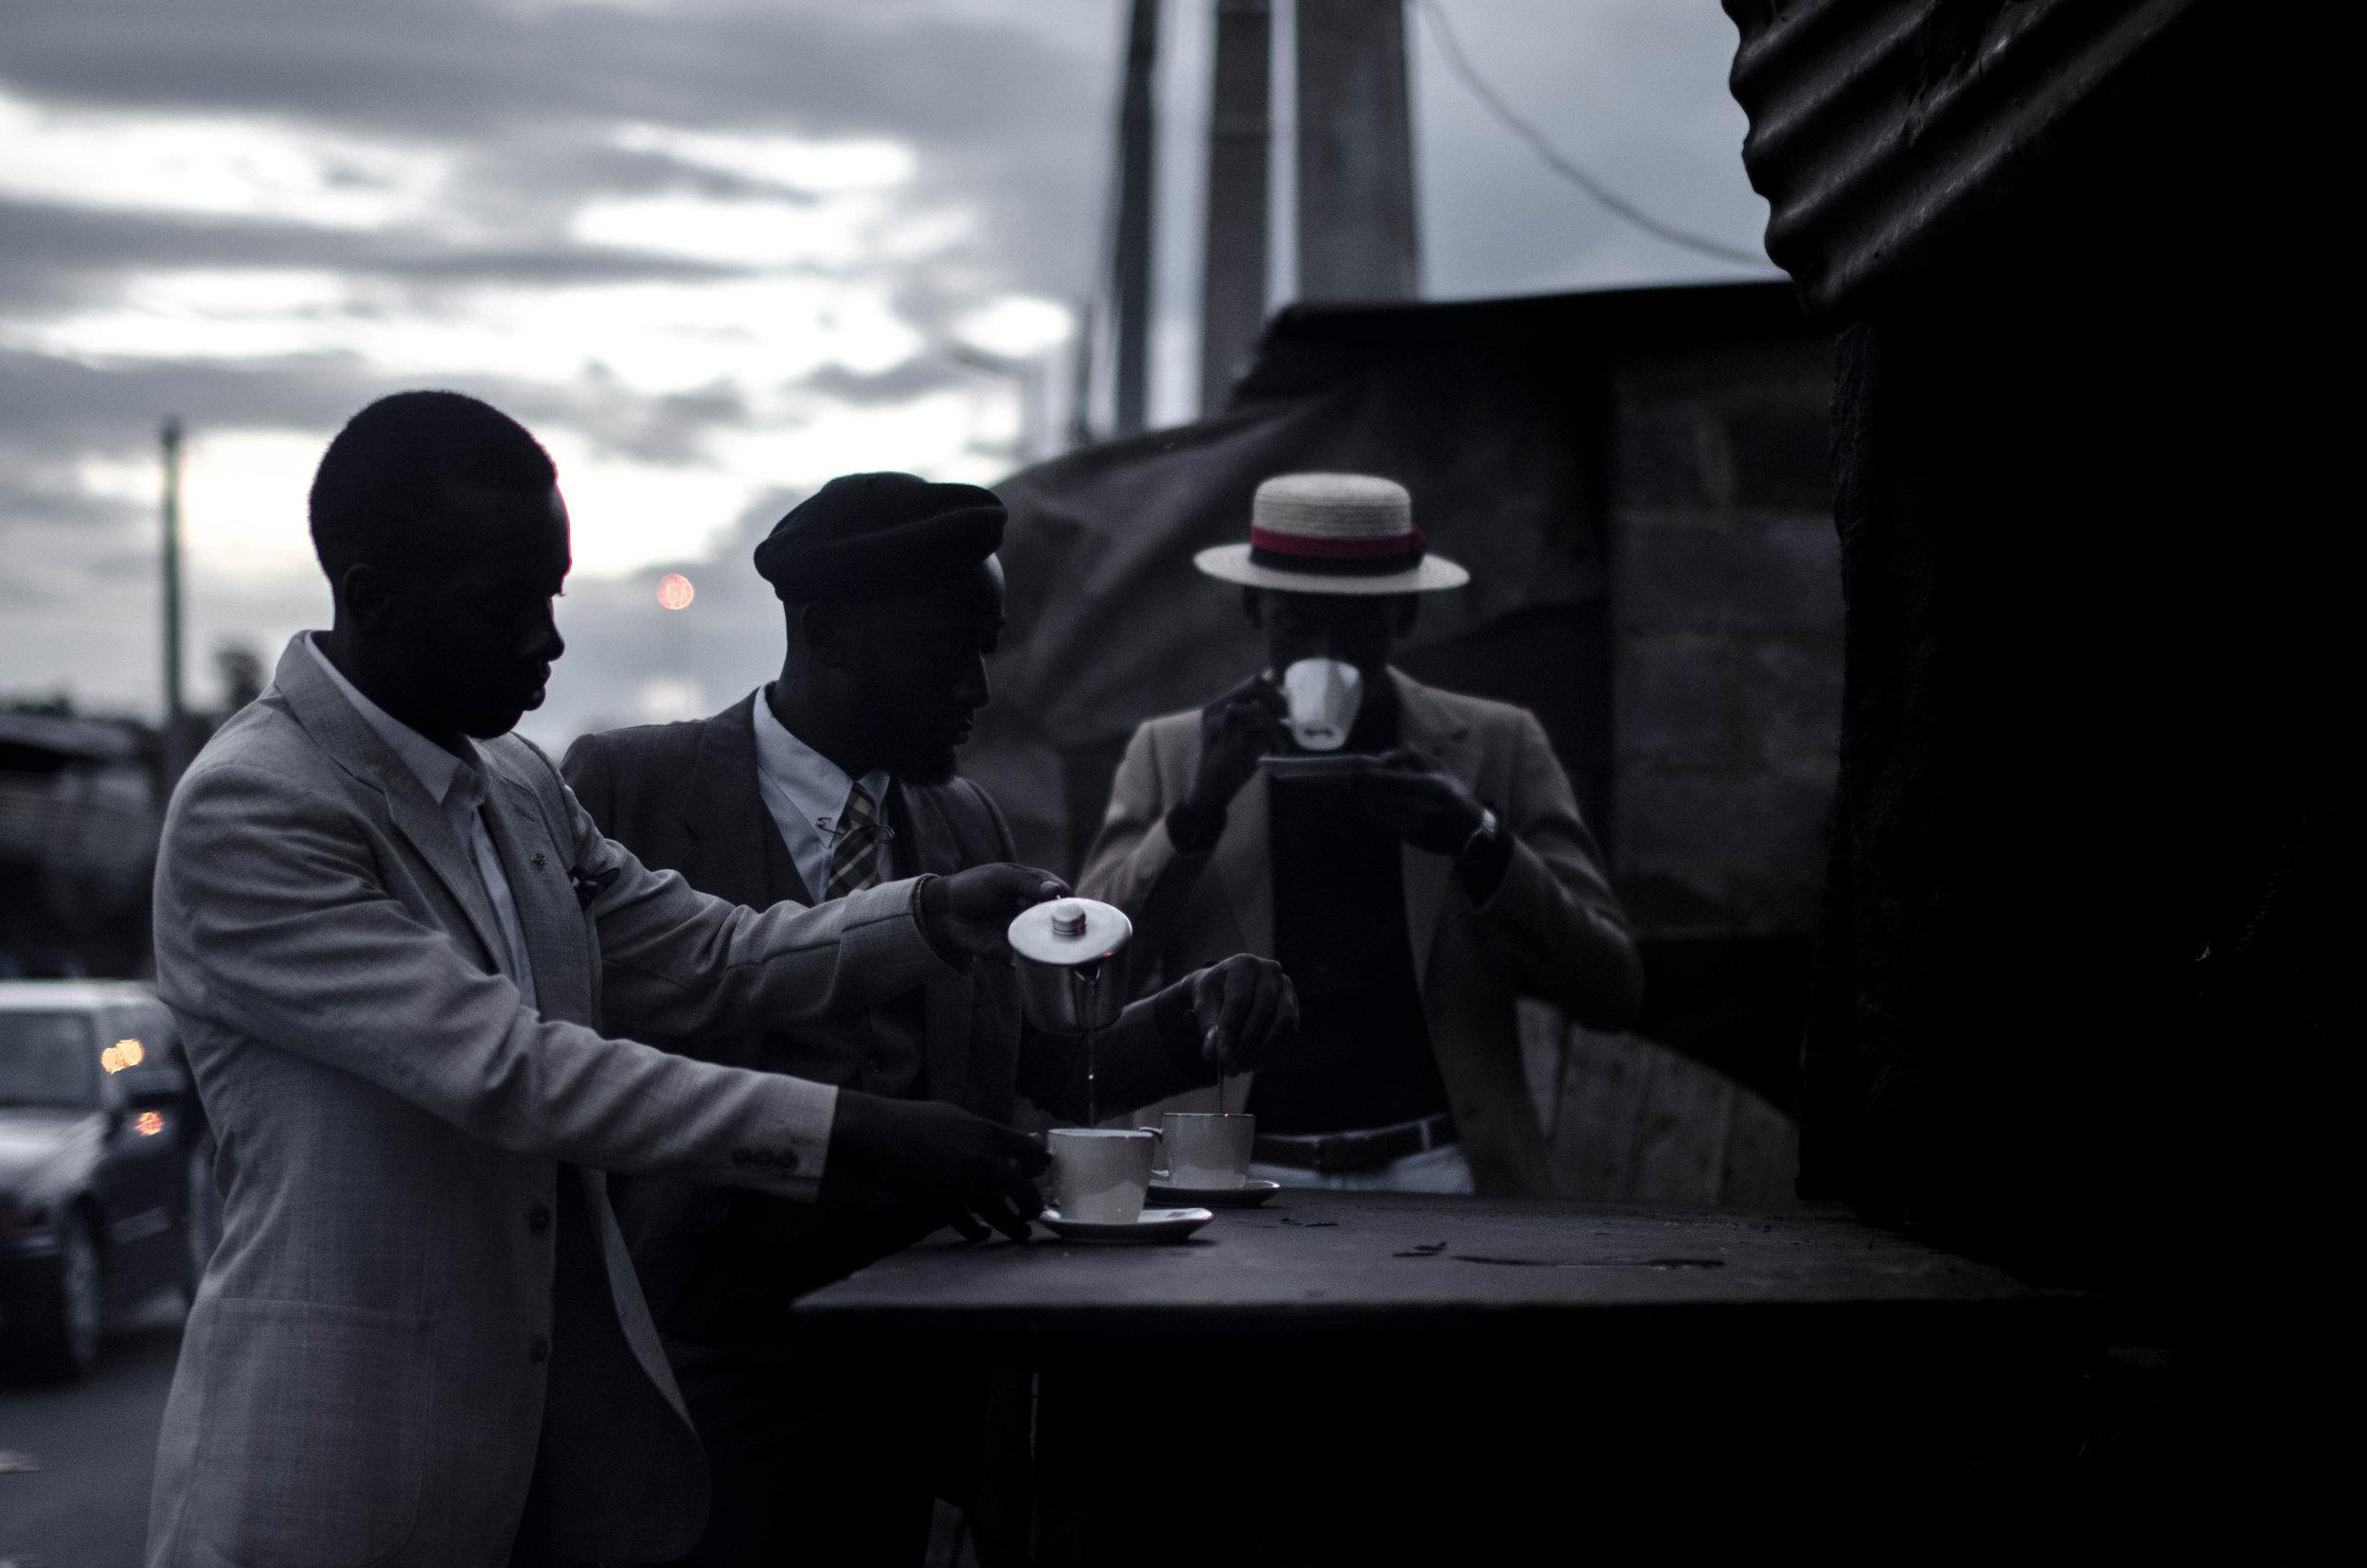 H.Hamese, David Maledimo, Lourens Gebhard and Bafana Mthembu – The three stages of preparing tea, 2014.jpg